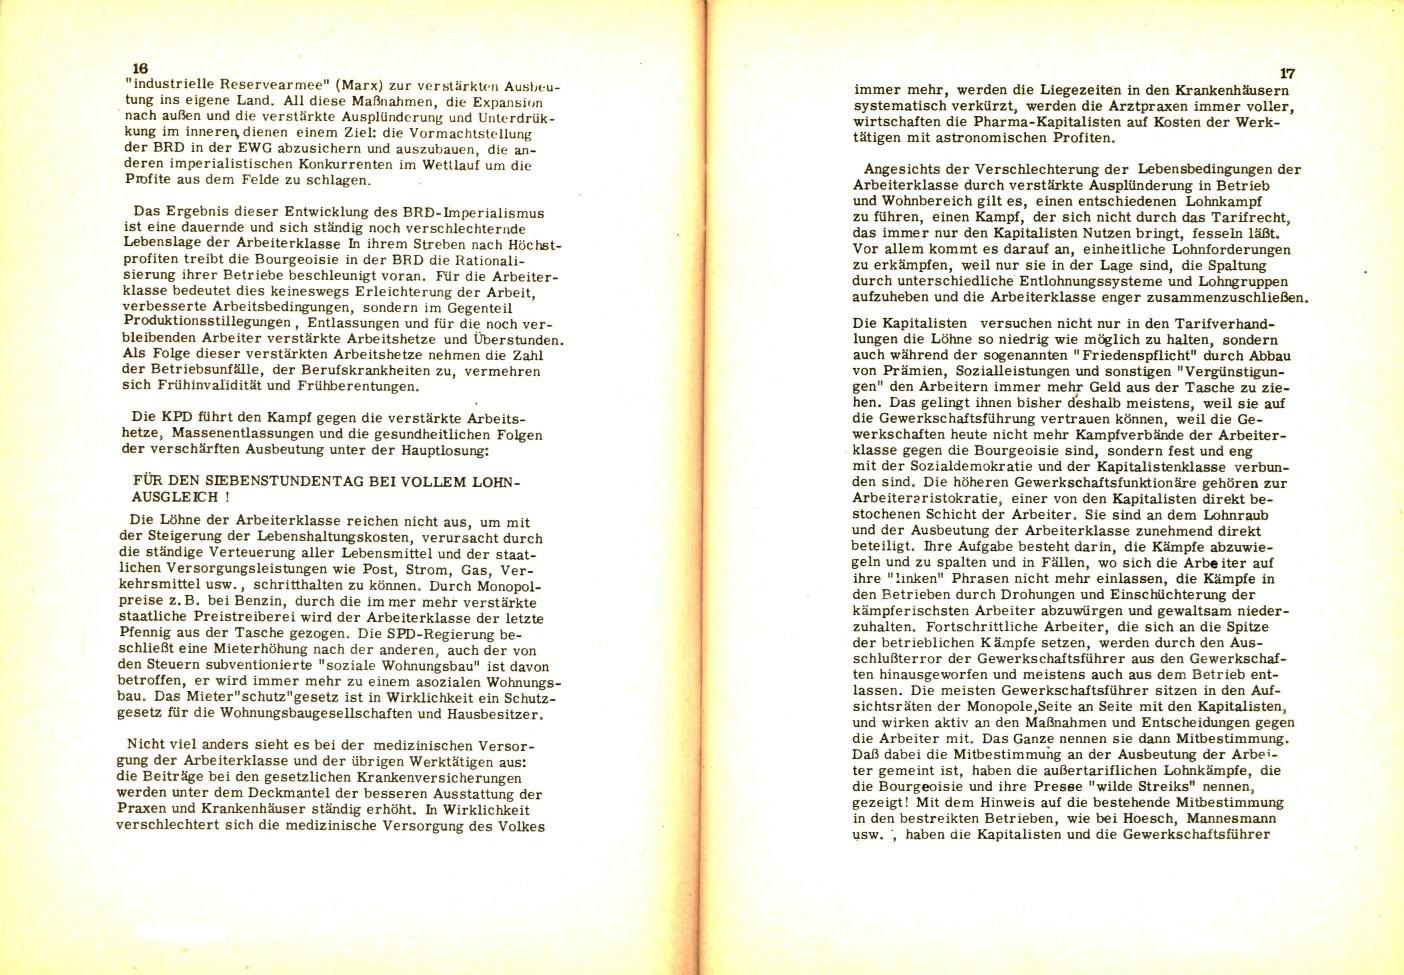 KOV_1973_Aktionsprogramm_11